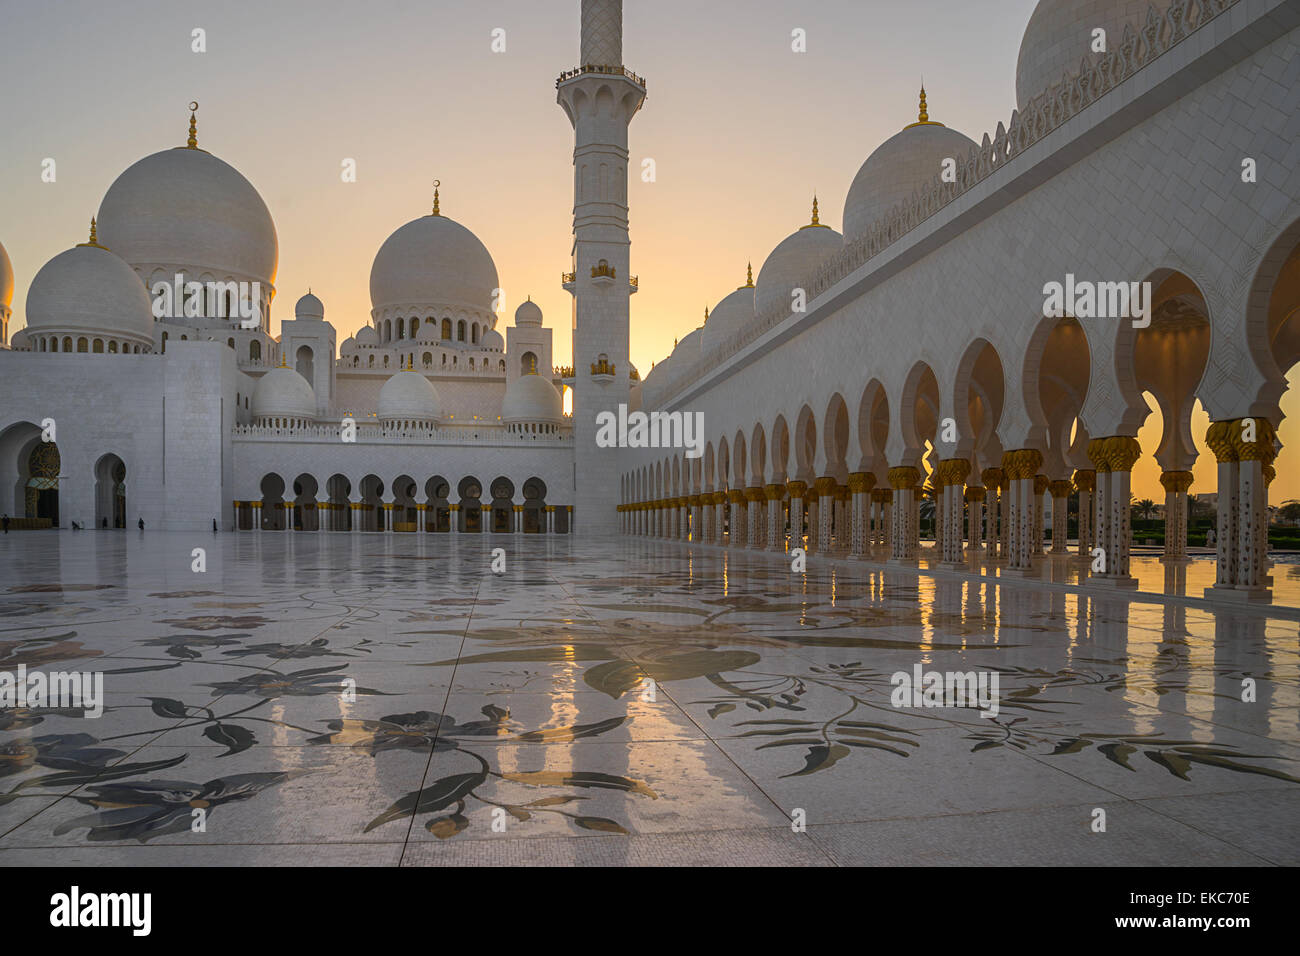 Sheikh Zayed Grande Moschea di Abu Dhabi Immagini Stock